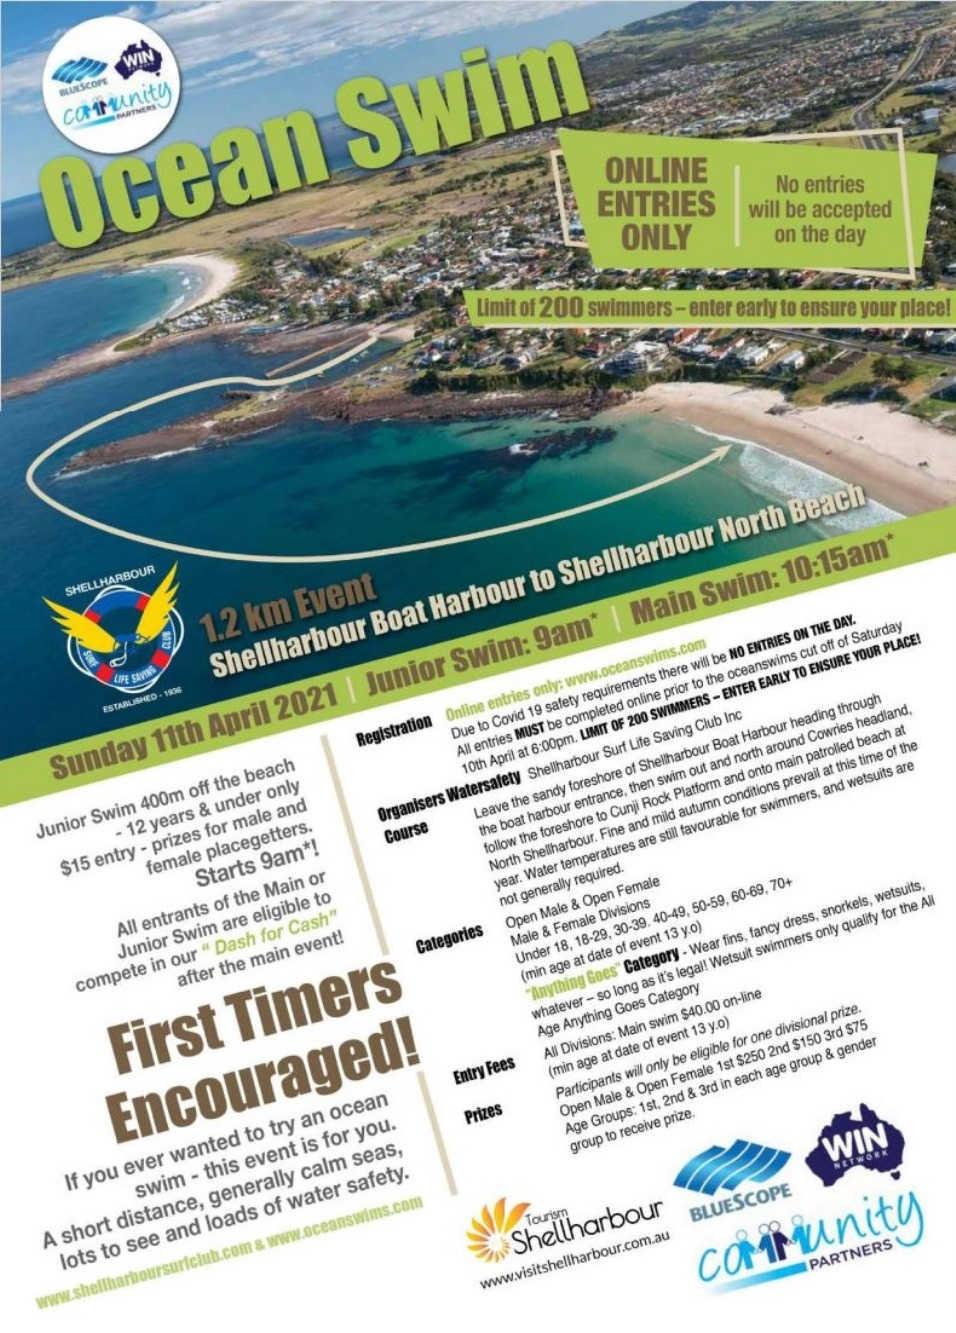 Mollymook ocean swimmers,Mollymook,Destination Mollymook Milton Ulladulla,Mollymook Beach,Mollymook Beach Waterfront,Charleville Qld,Charleville